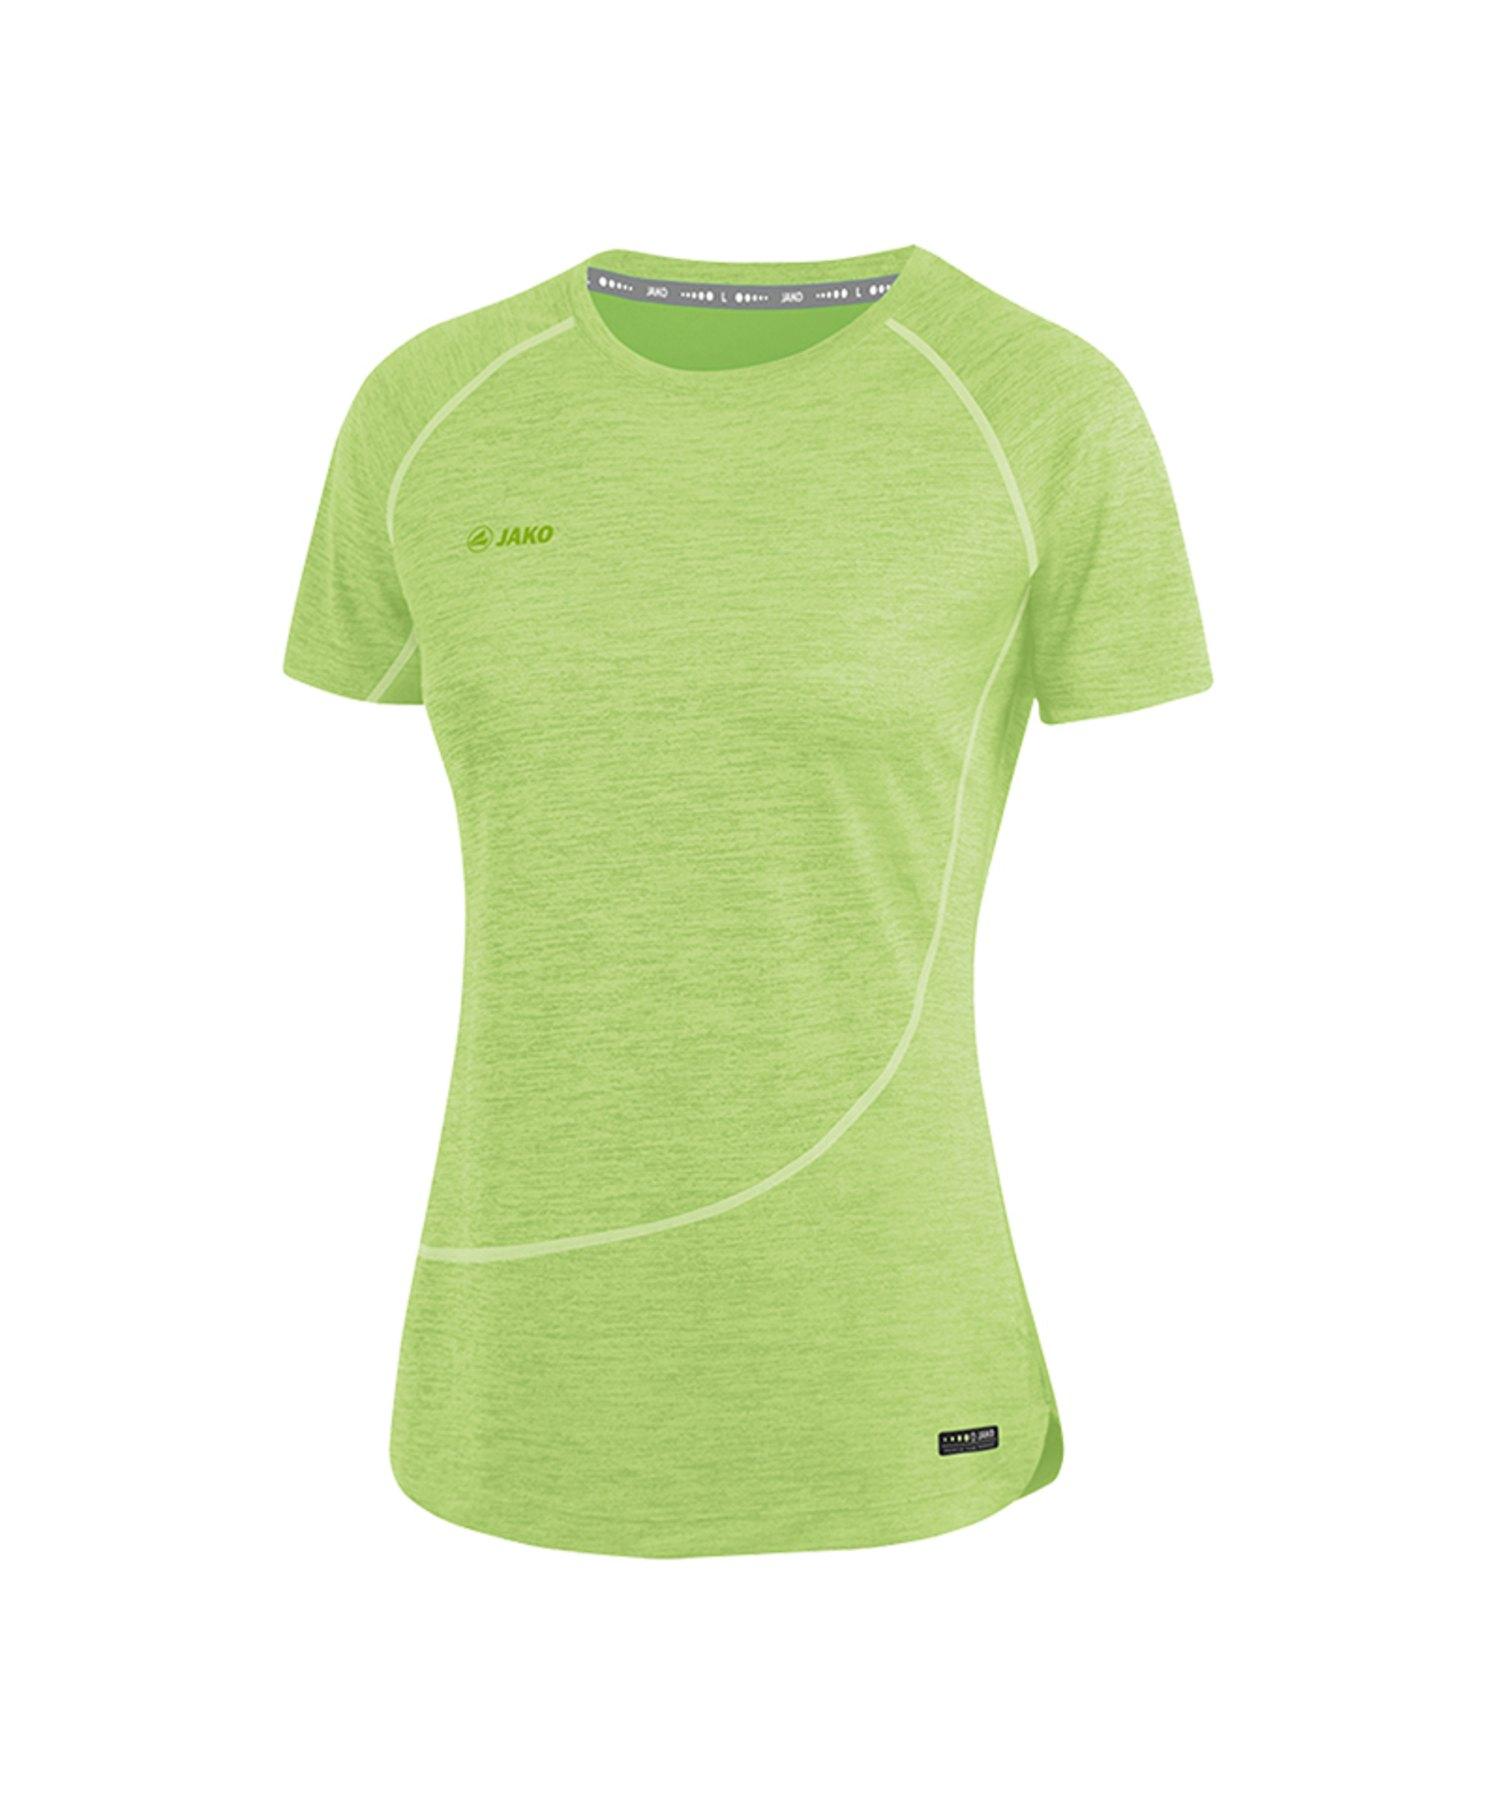 Jako T-Shirt Active Basics Damen Grün F25 - Gruen